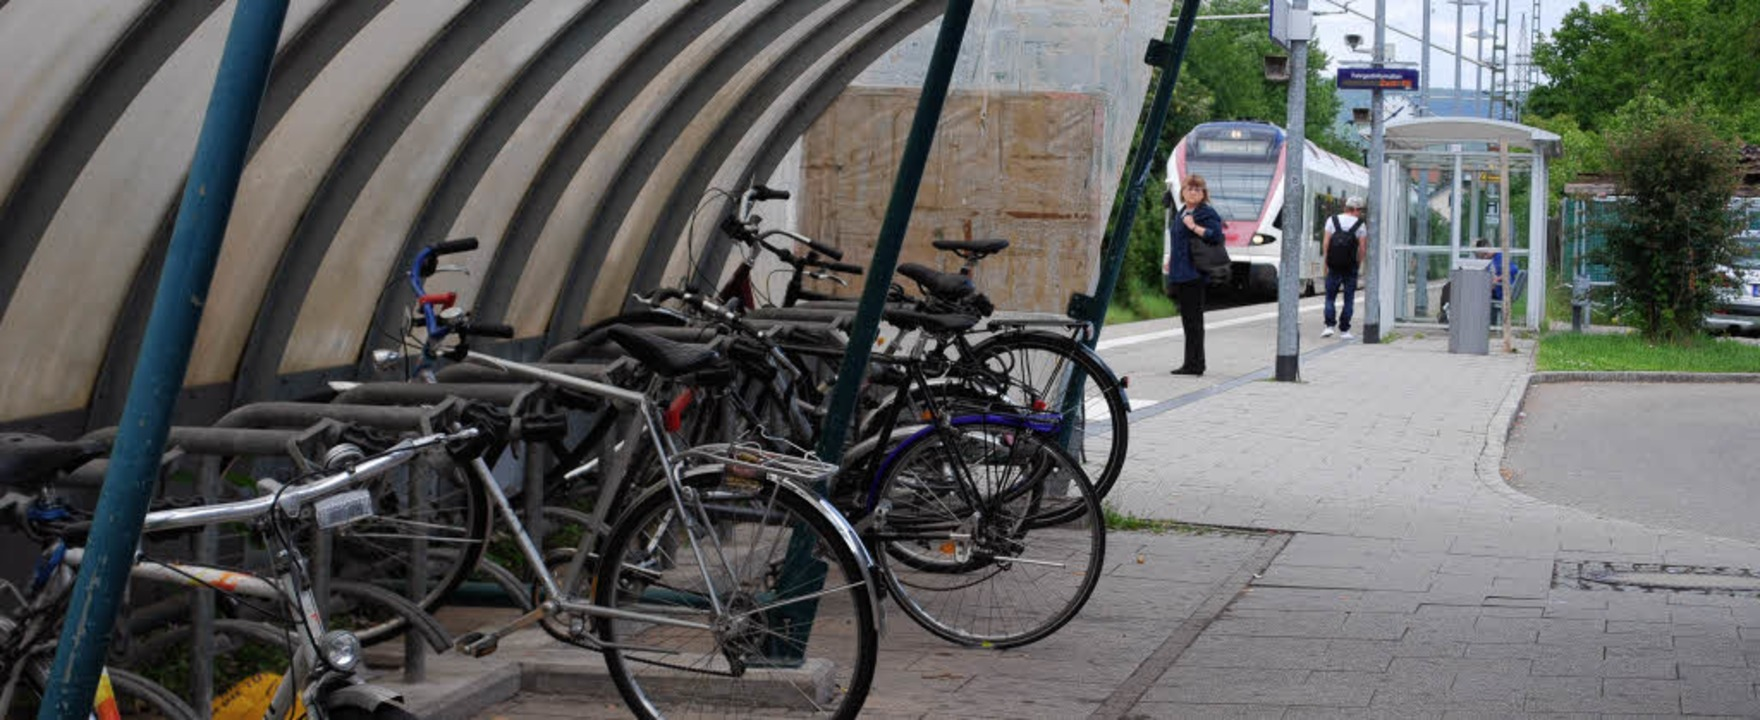 Das Fahrrad als Verkehrsmittel im Alltag will die IG Velo stärken.     Foto: Thomas Loisl Mink